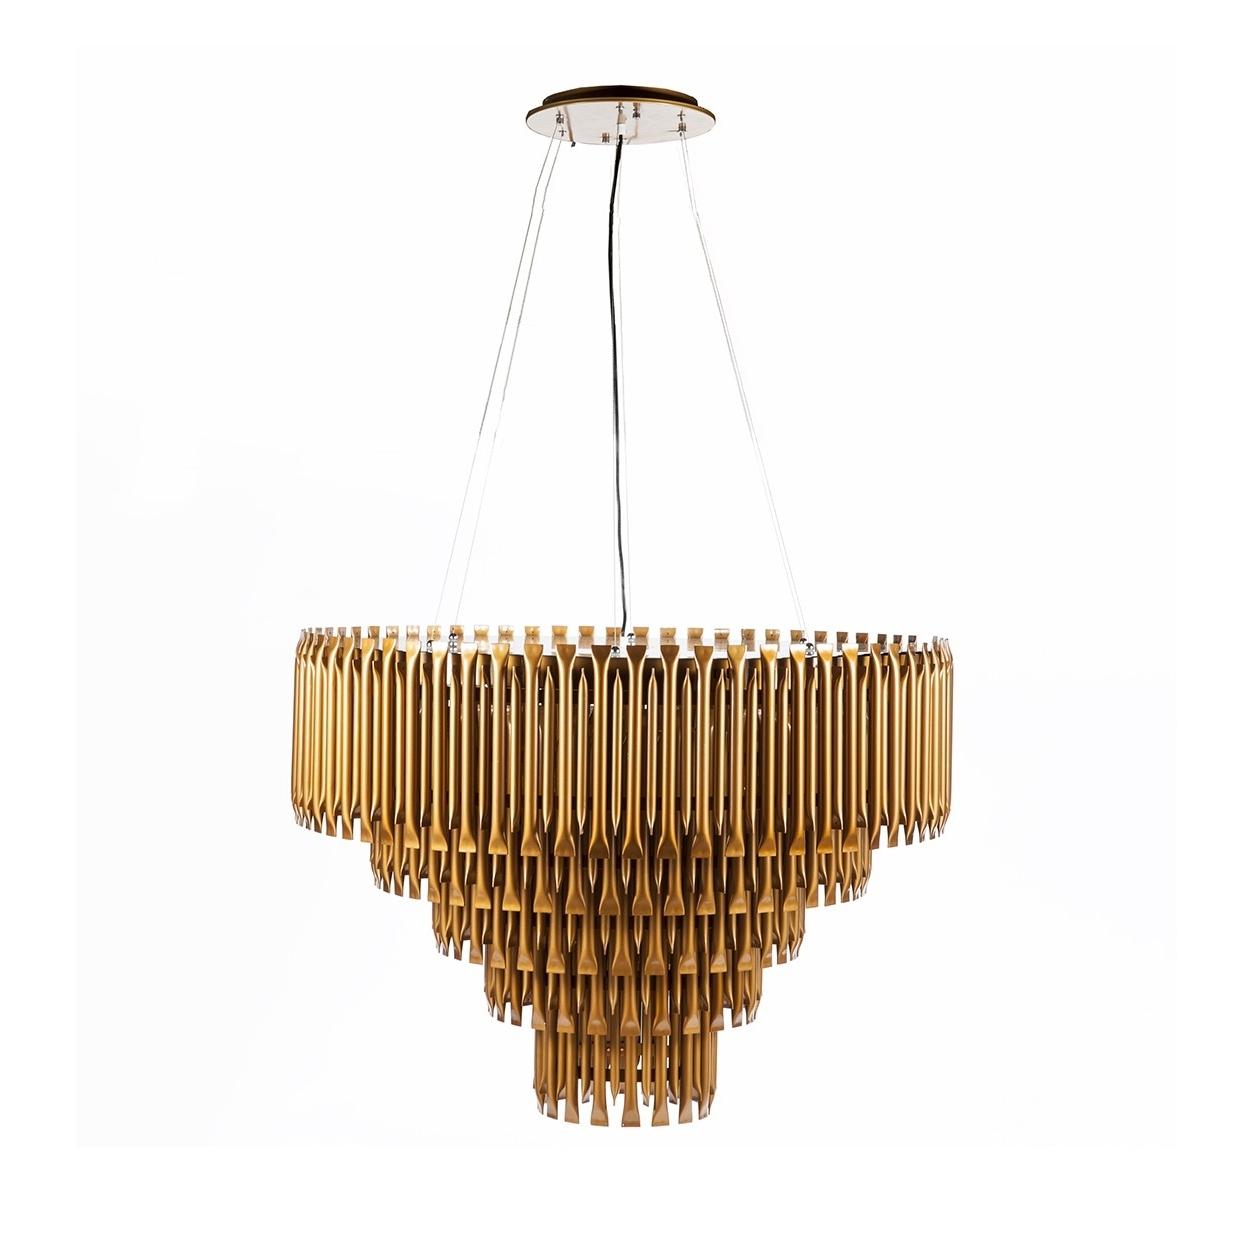 Mcgrath Mid Century Modern Led Chandelier At Modernist Lighting With Current Bronze Modern Chandelier (View 2 of 15)